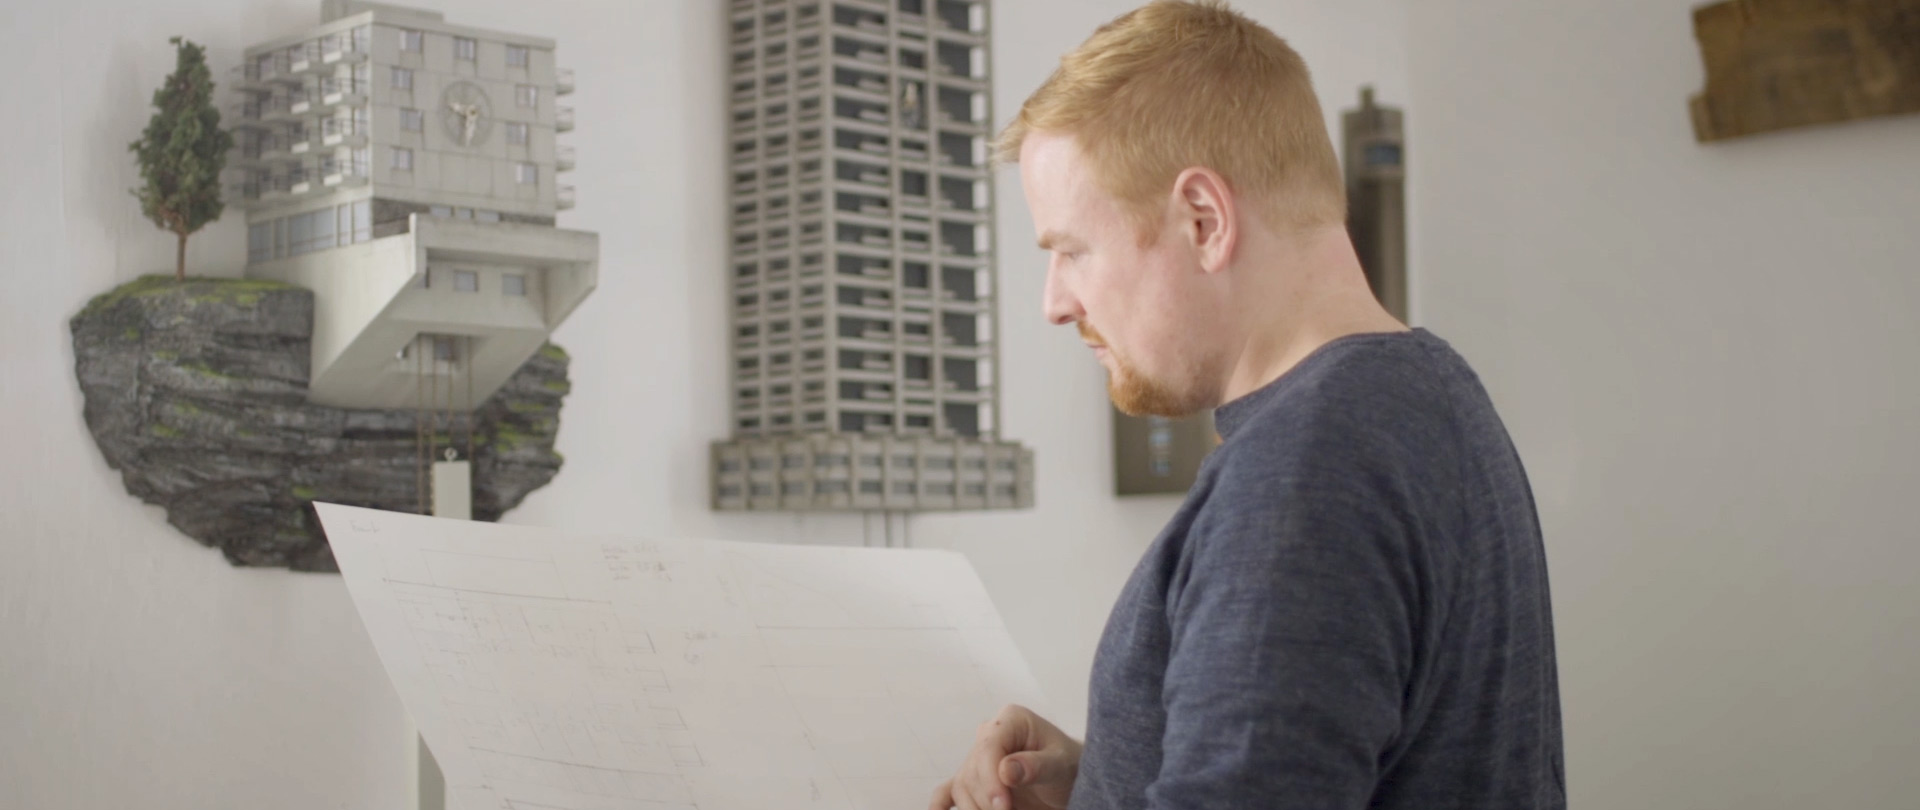 Standbild aus dem Portraitfilm Guido Zimmermann